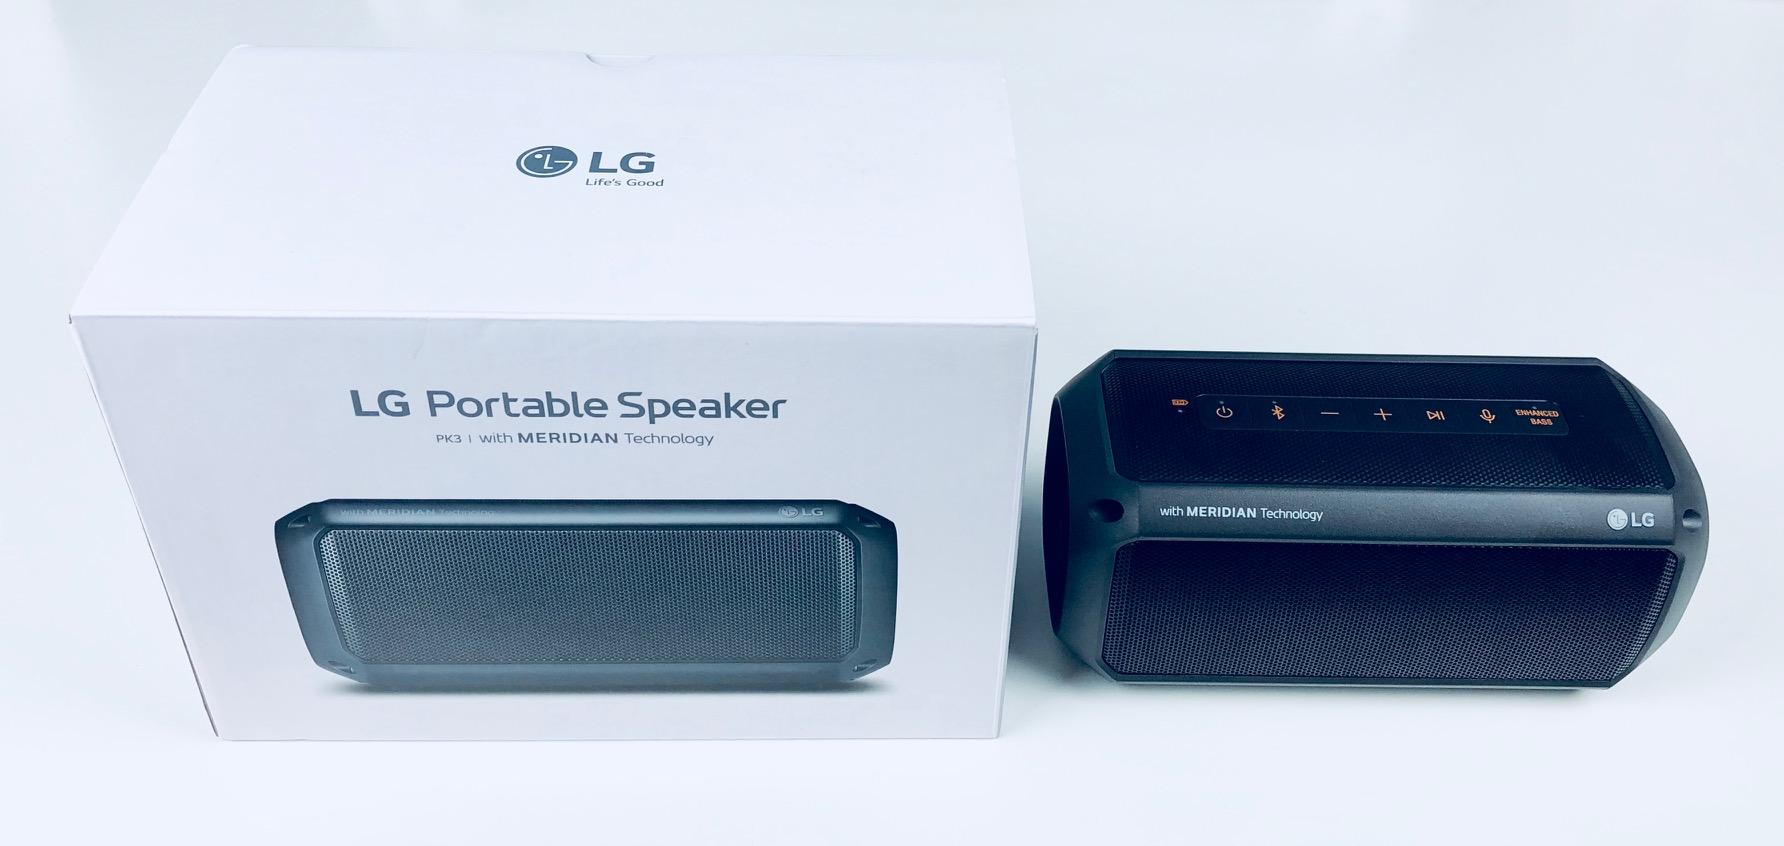 LG PK3 Test